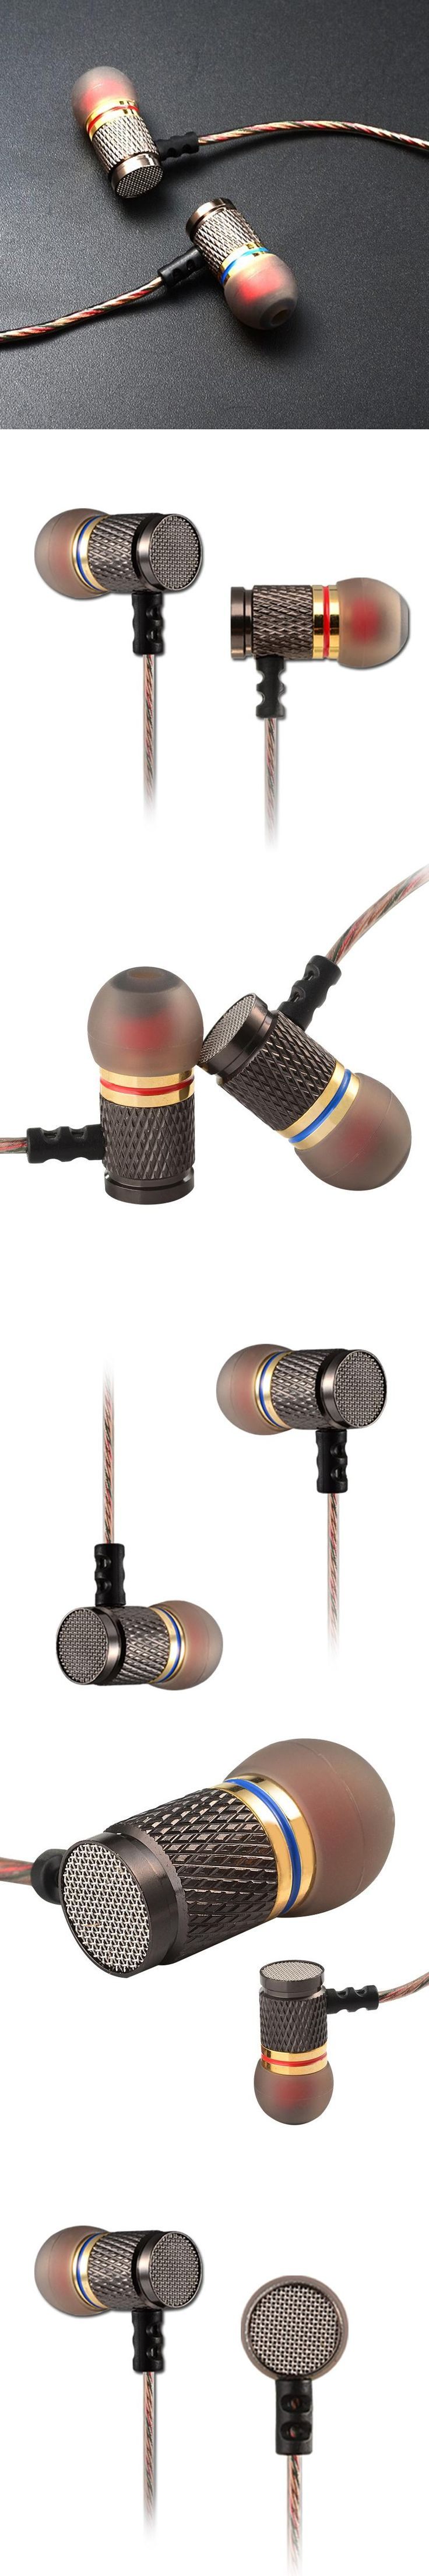 Original KZ EDR1 Moving Coil HiFi Stereo Oyuncu Kulaklik In Ear Earphones Casque Sans Fil Audifono Celular Aparelho de Som&Mic